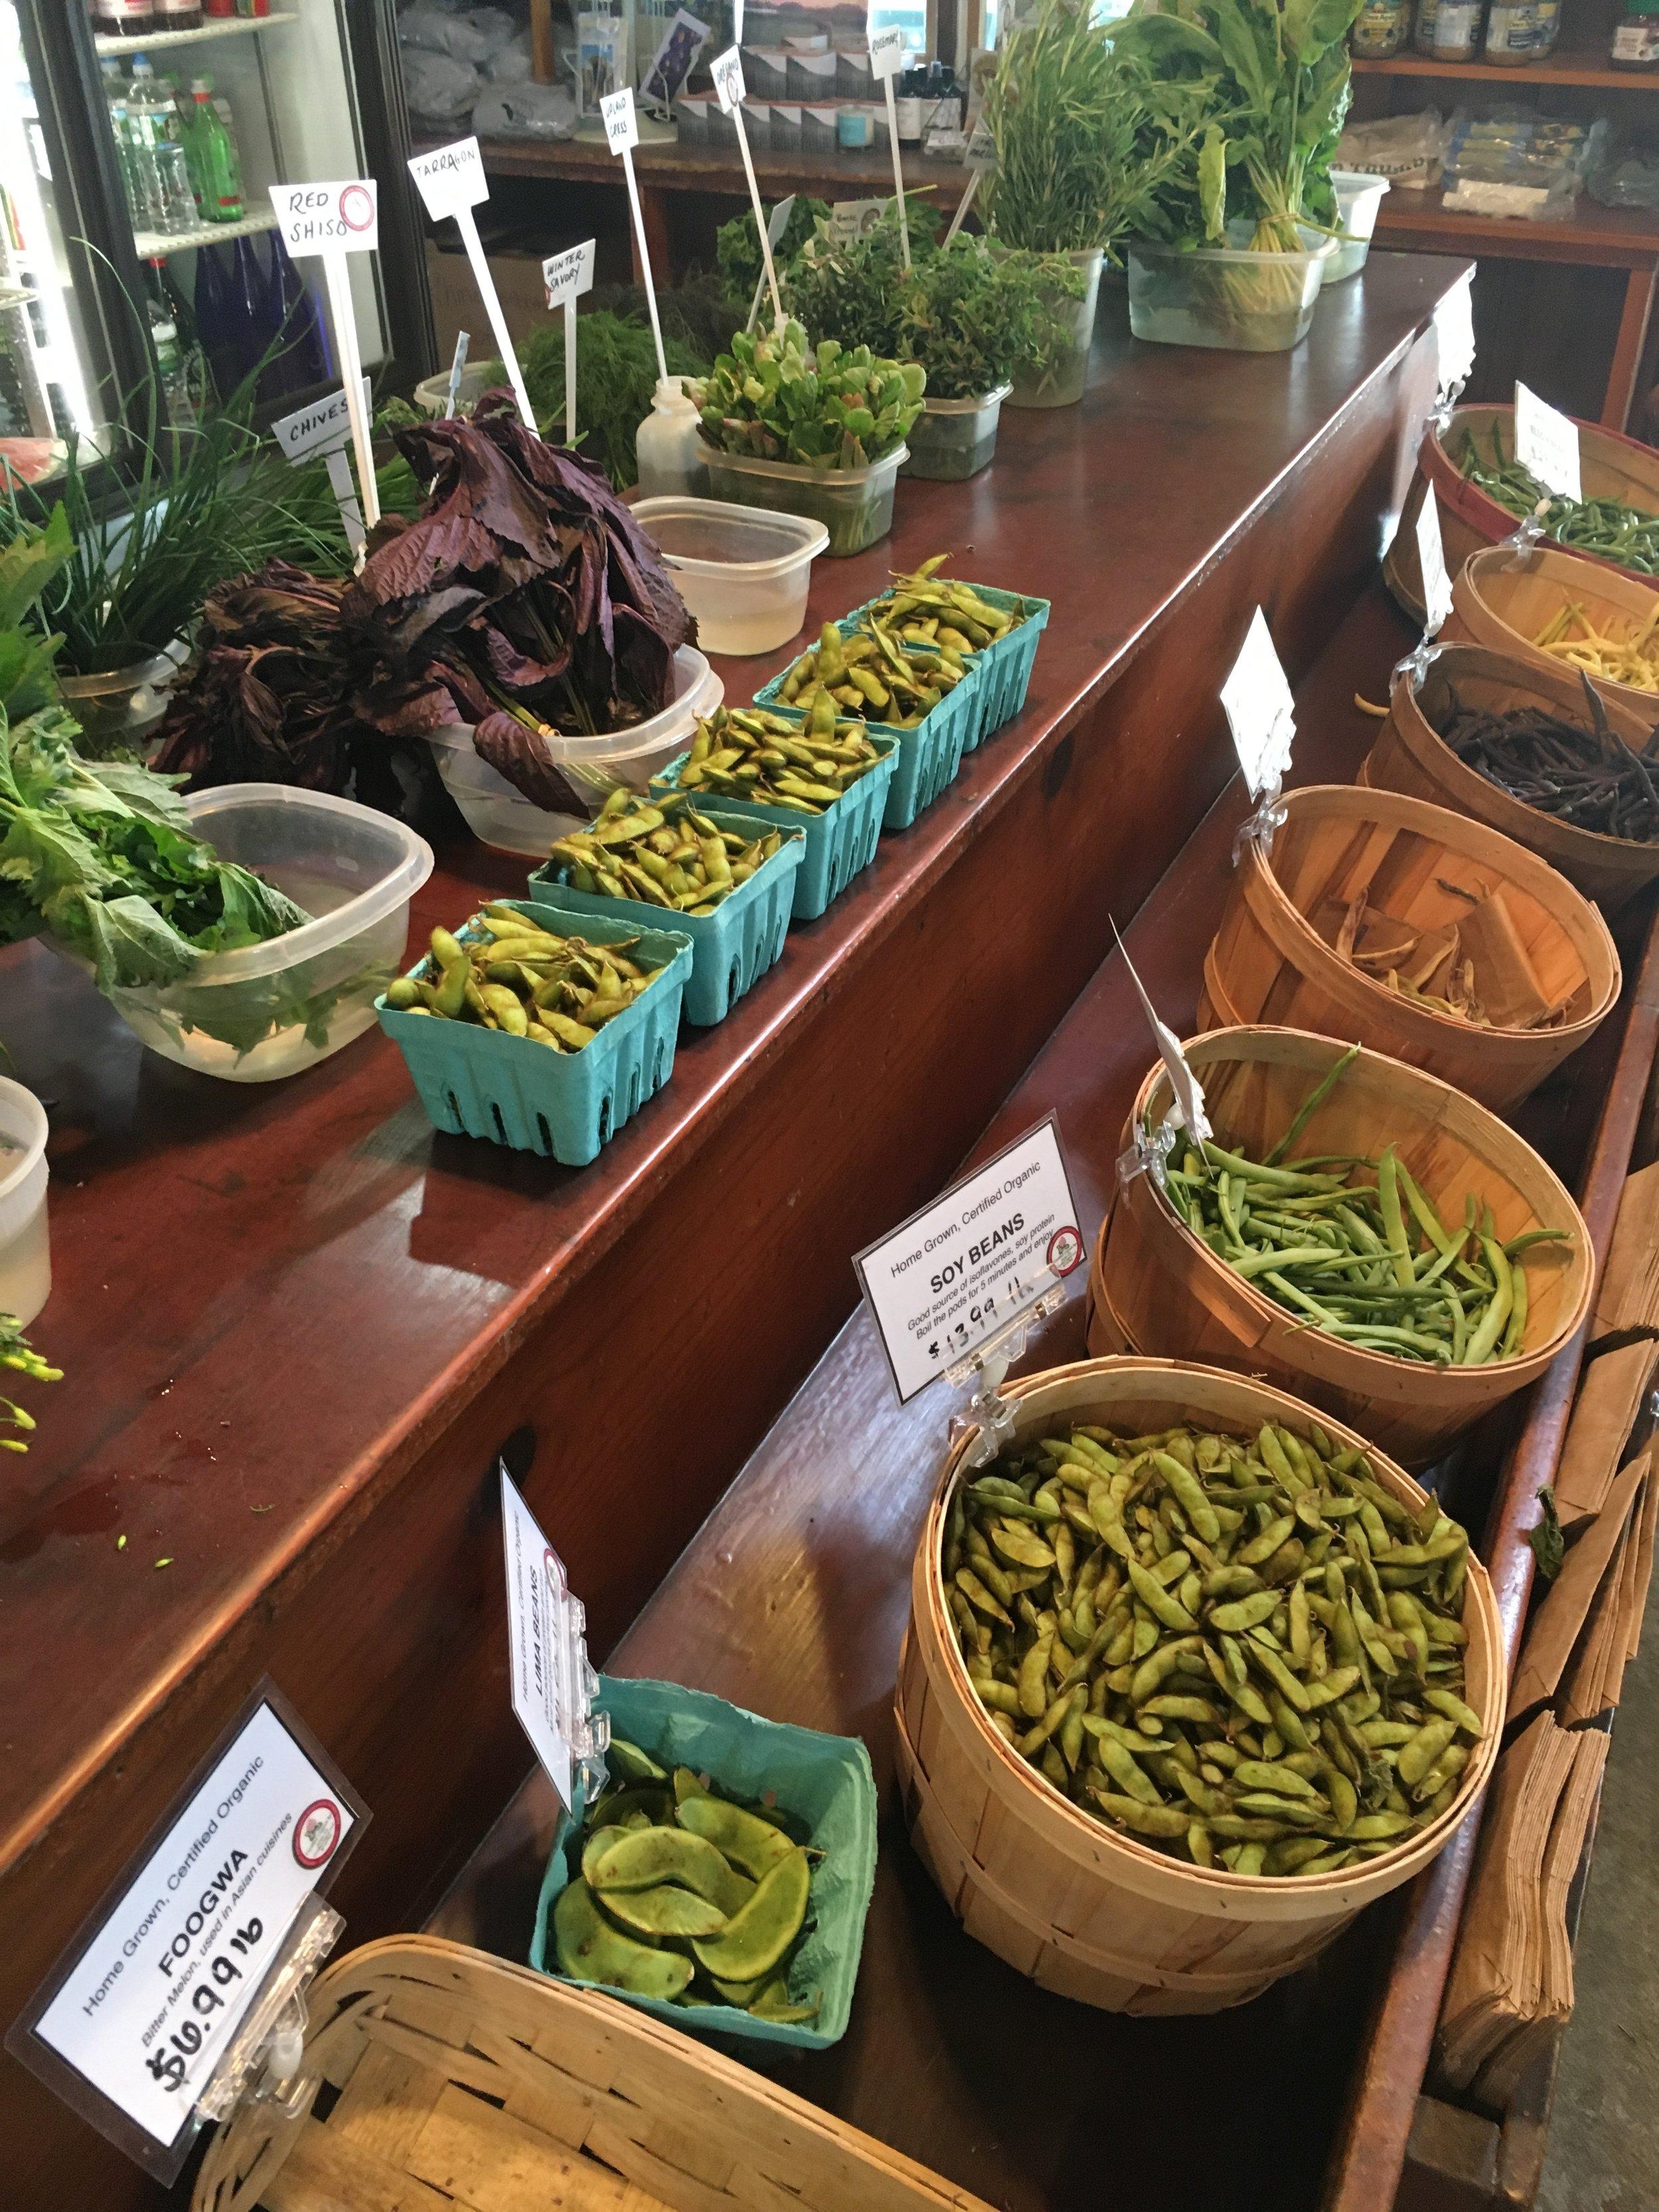 Hamptons gren thumb herbs etc.JPG